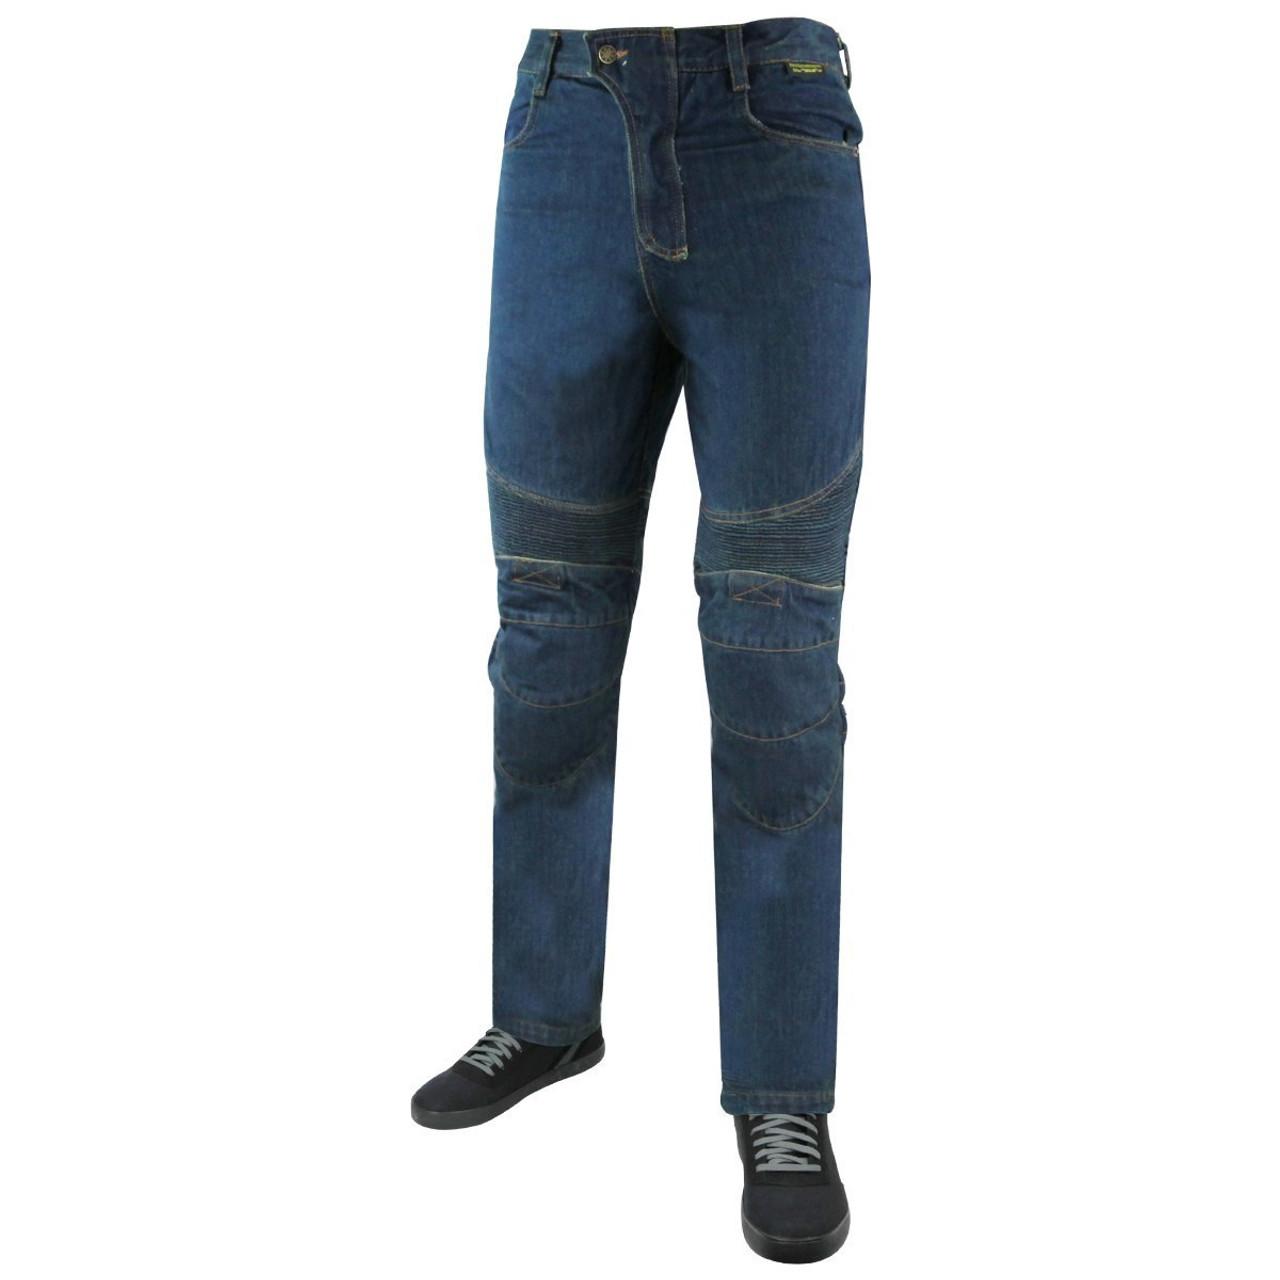 "Motorcycle Jeans Mens Kevlar Waterproof Rmoured Motorbike Trousers Protective Lining Biker Cargo Reinforced Padded Armour Jean Trouser Pant Black-XS=29.5/"" 75cm Waist"